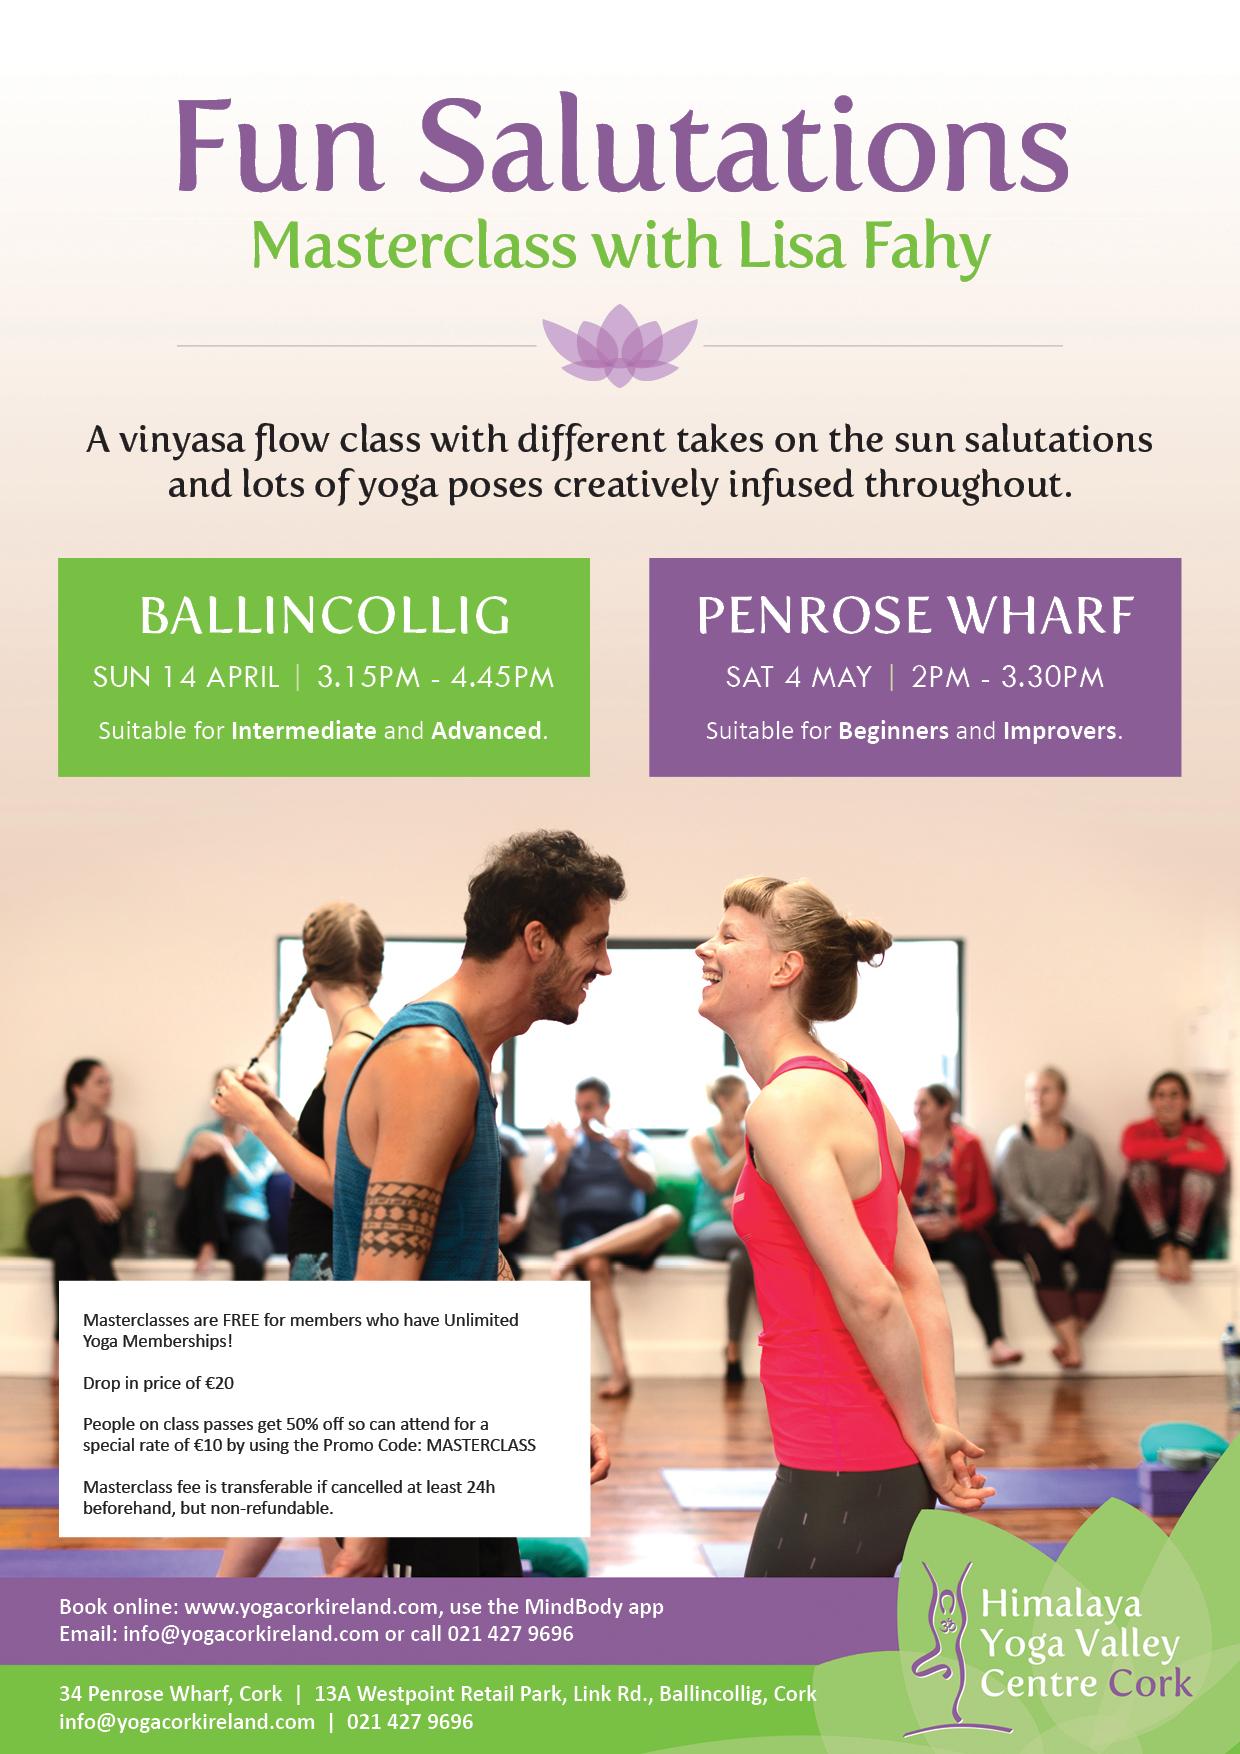 Fun Salutations Masterclass with Lisa Fahy!   Himalaya Yoga